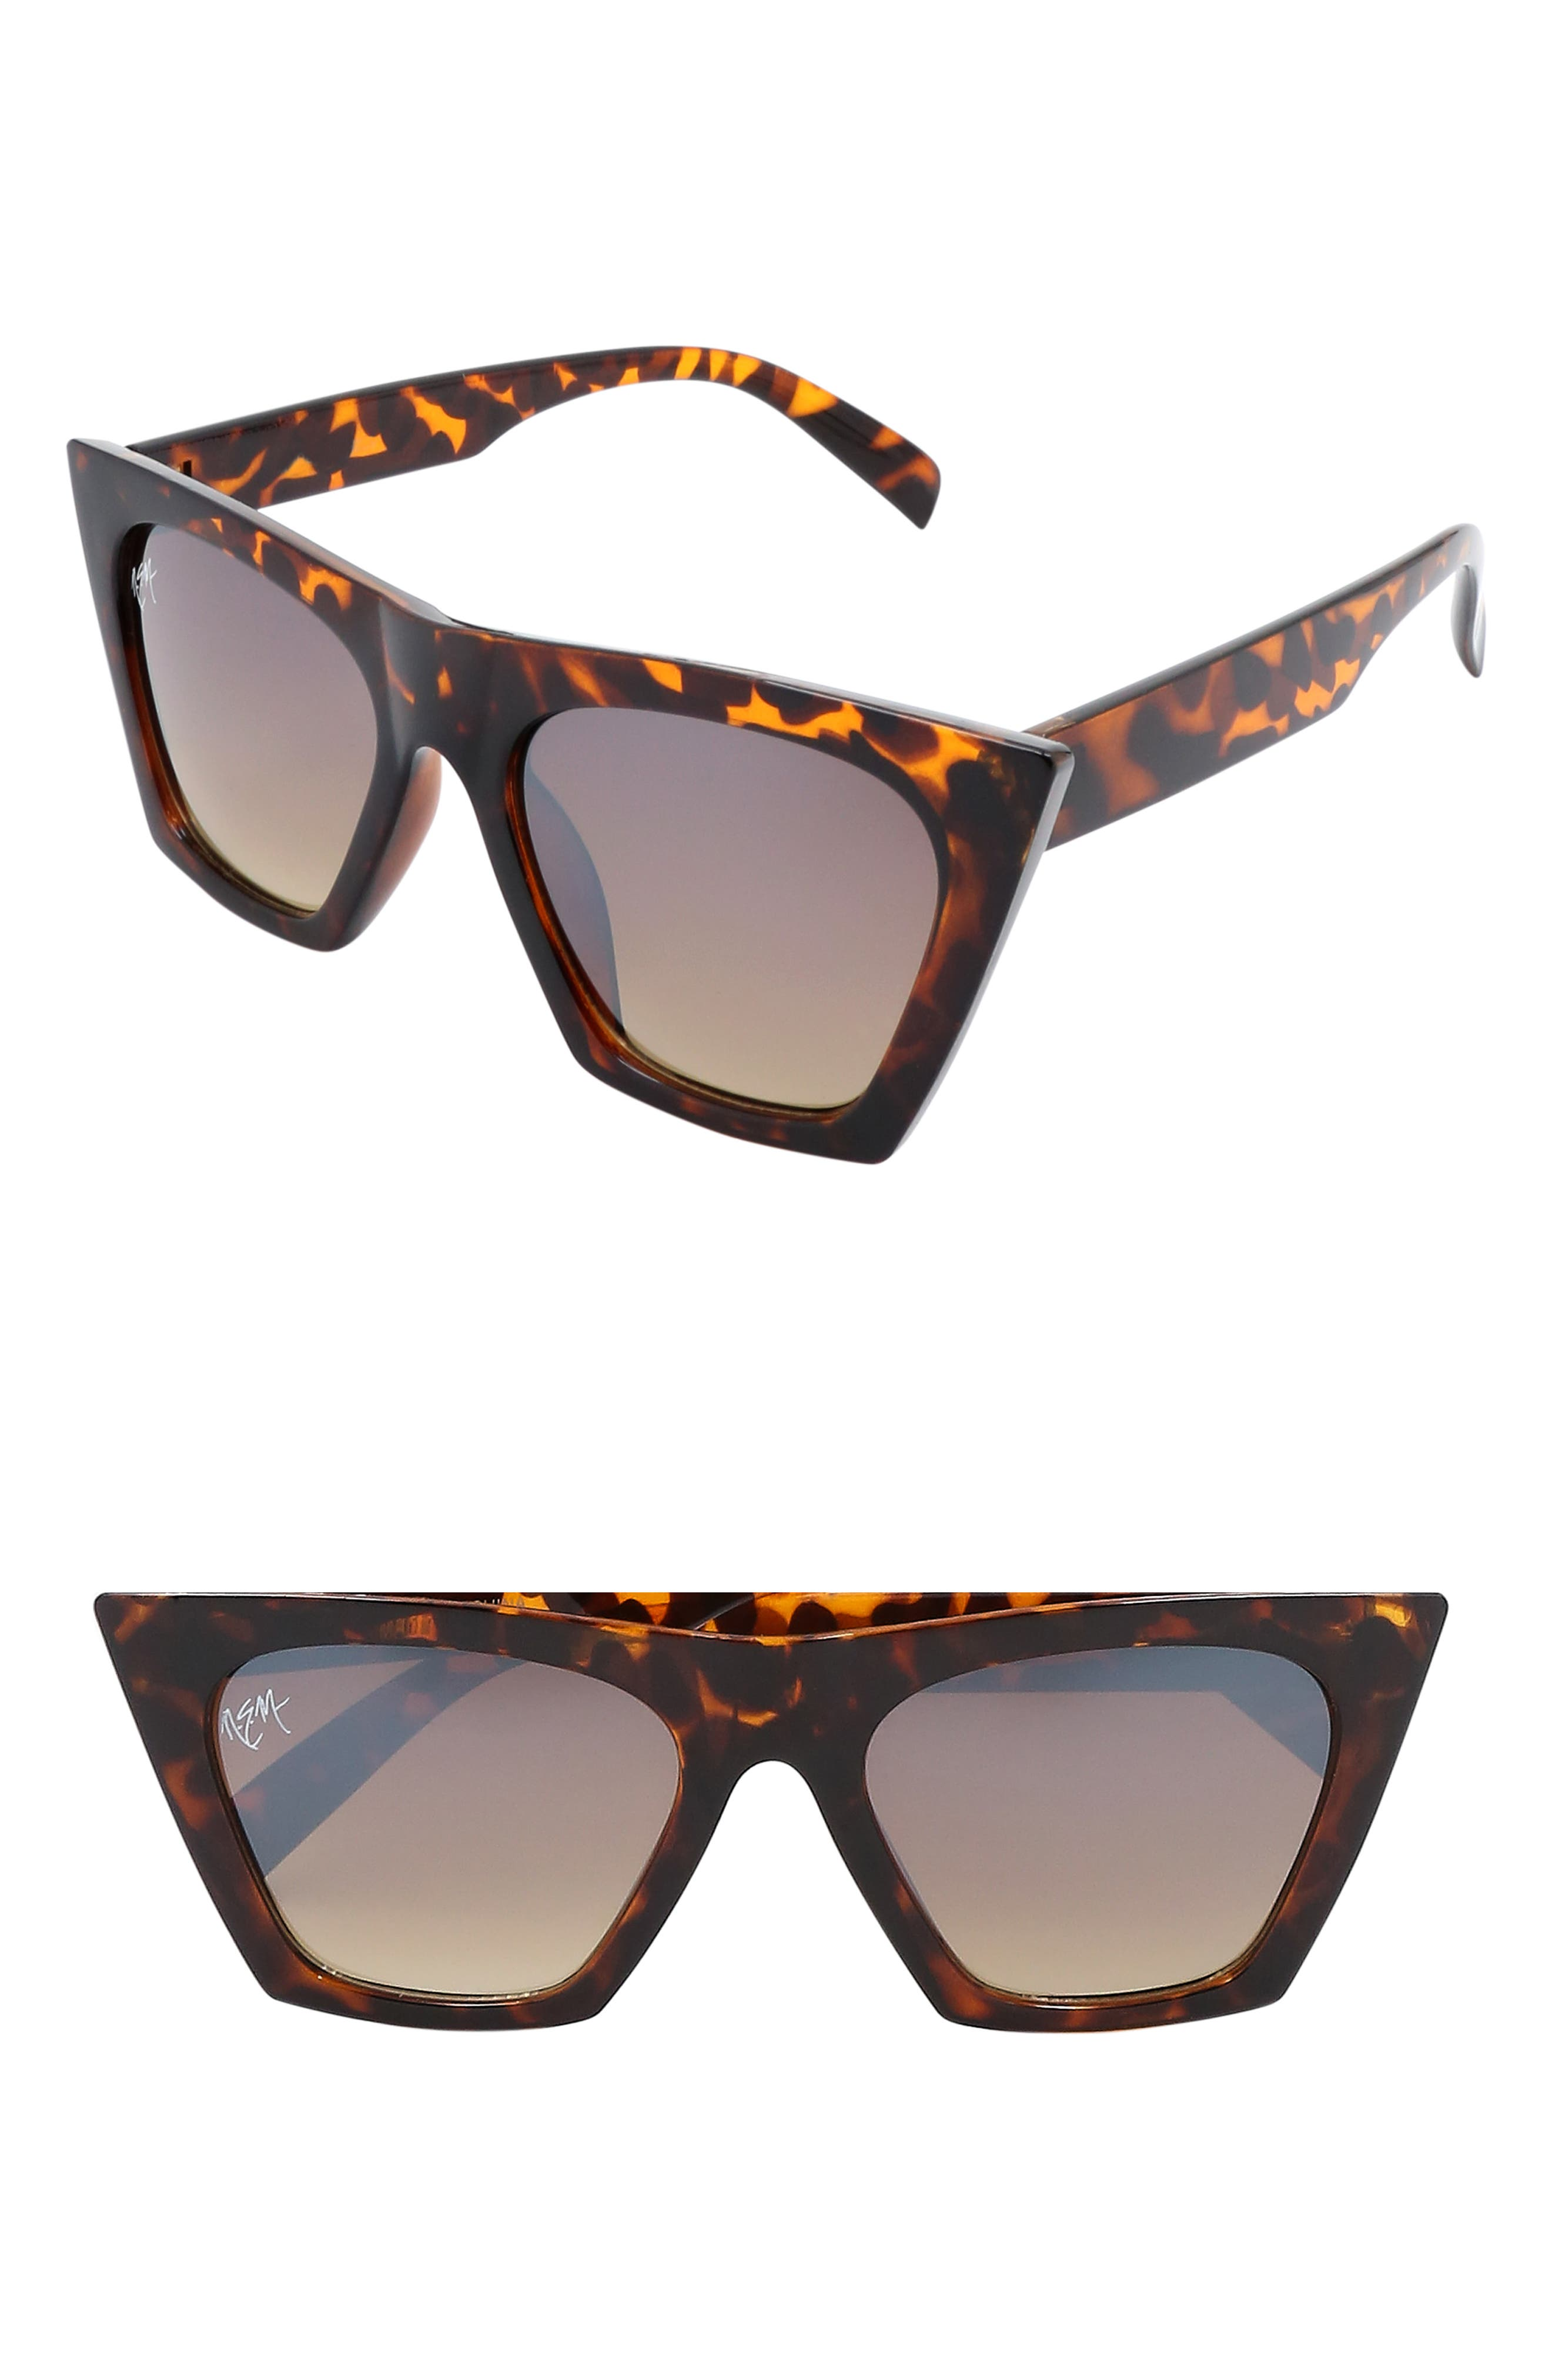 Retro Sunglasses | Vintage Glasses | New Vintage Eyeglasses Womens Nem Posh 50Mm Gradient Angular Sunglasses - Tortoise W Grey Gradient Lens $65.00 AT vintagedancer.com